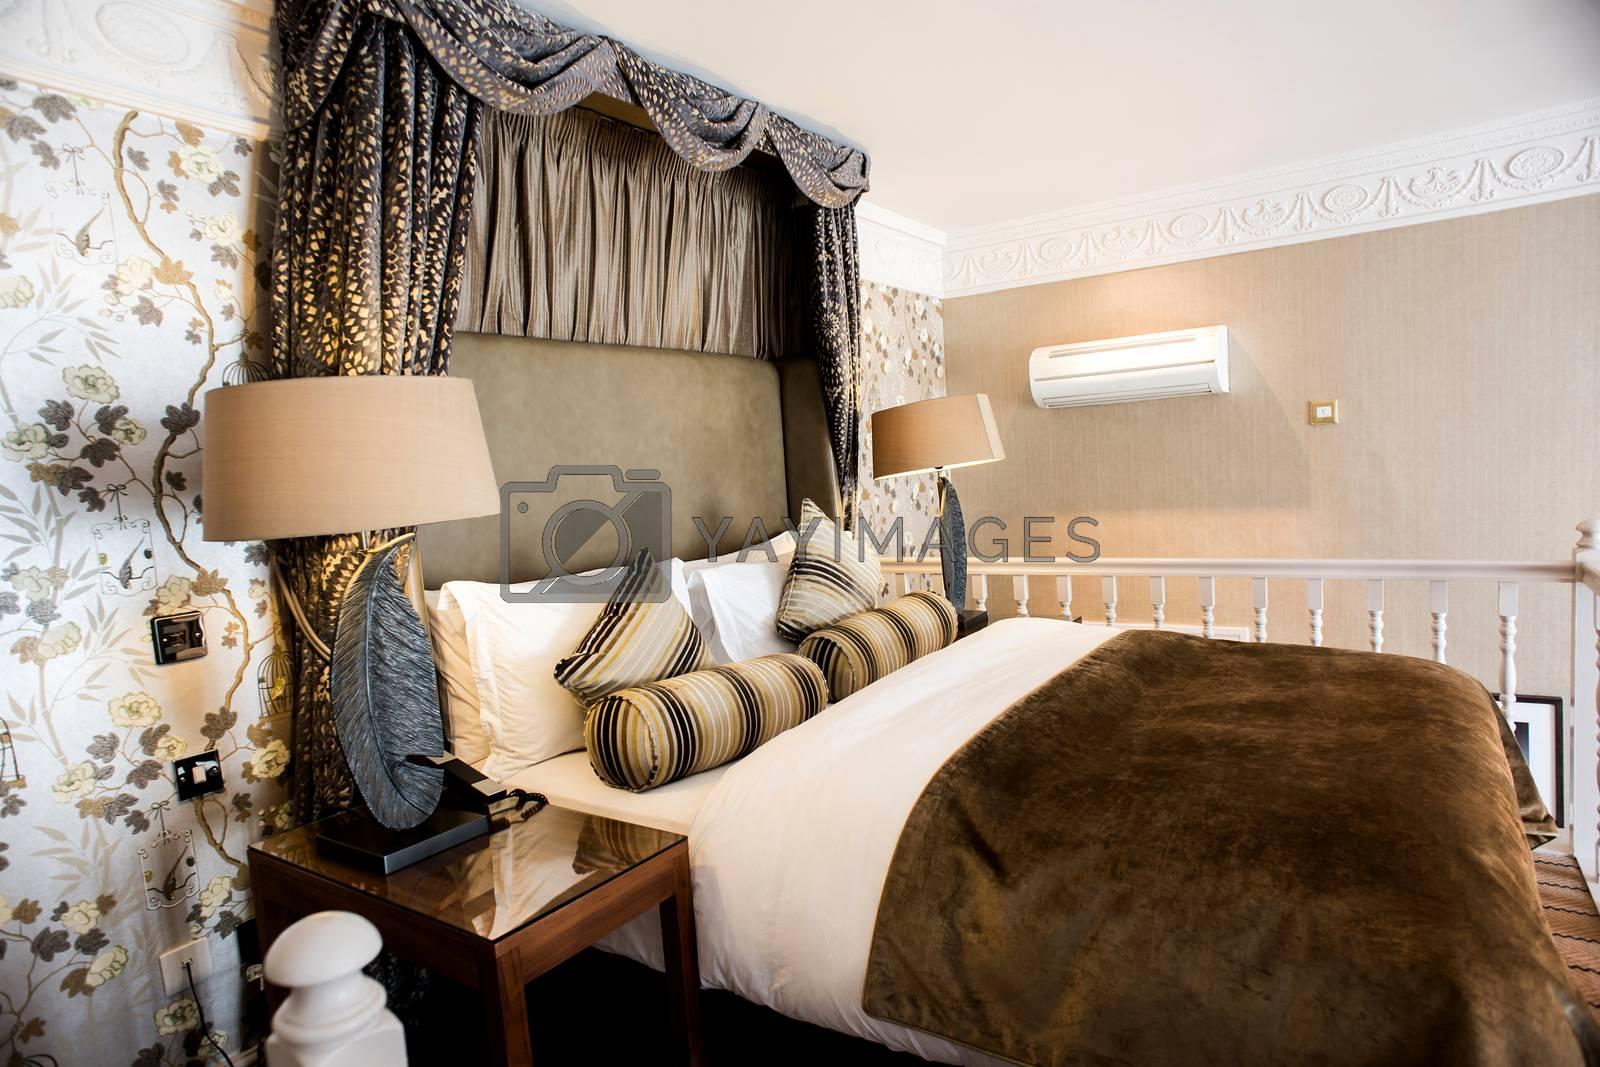 Master luxurious bedroom in elegant home